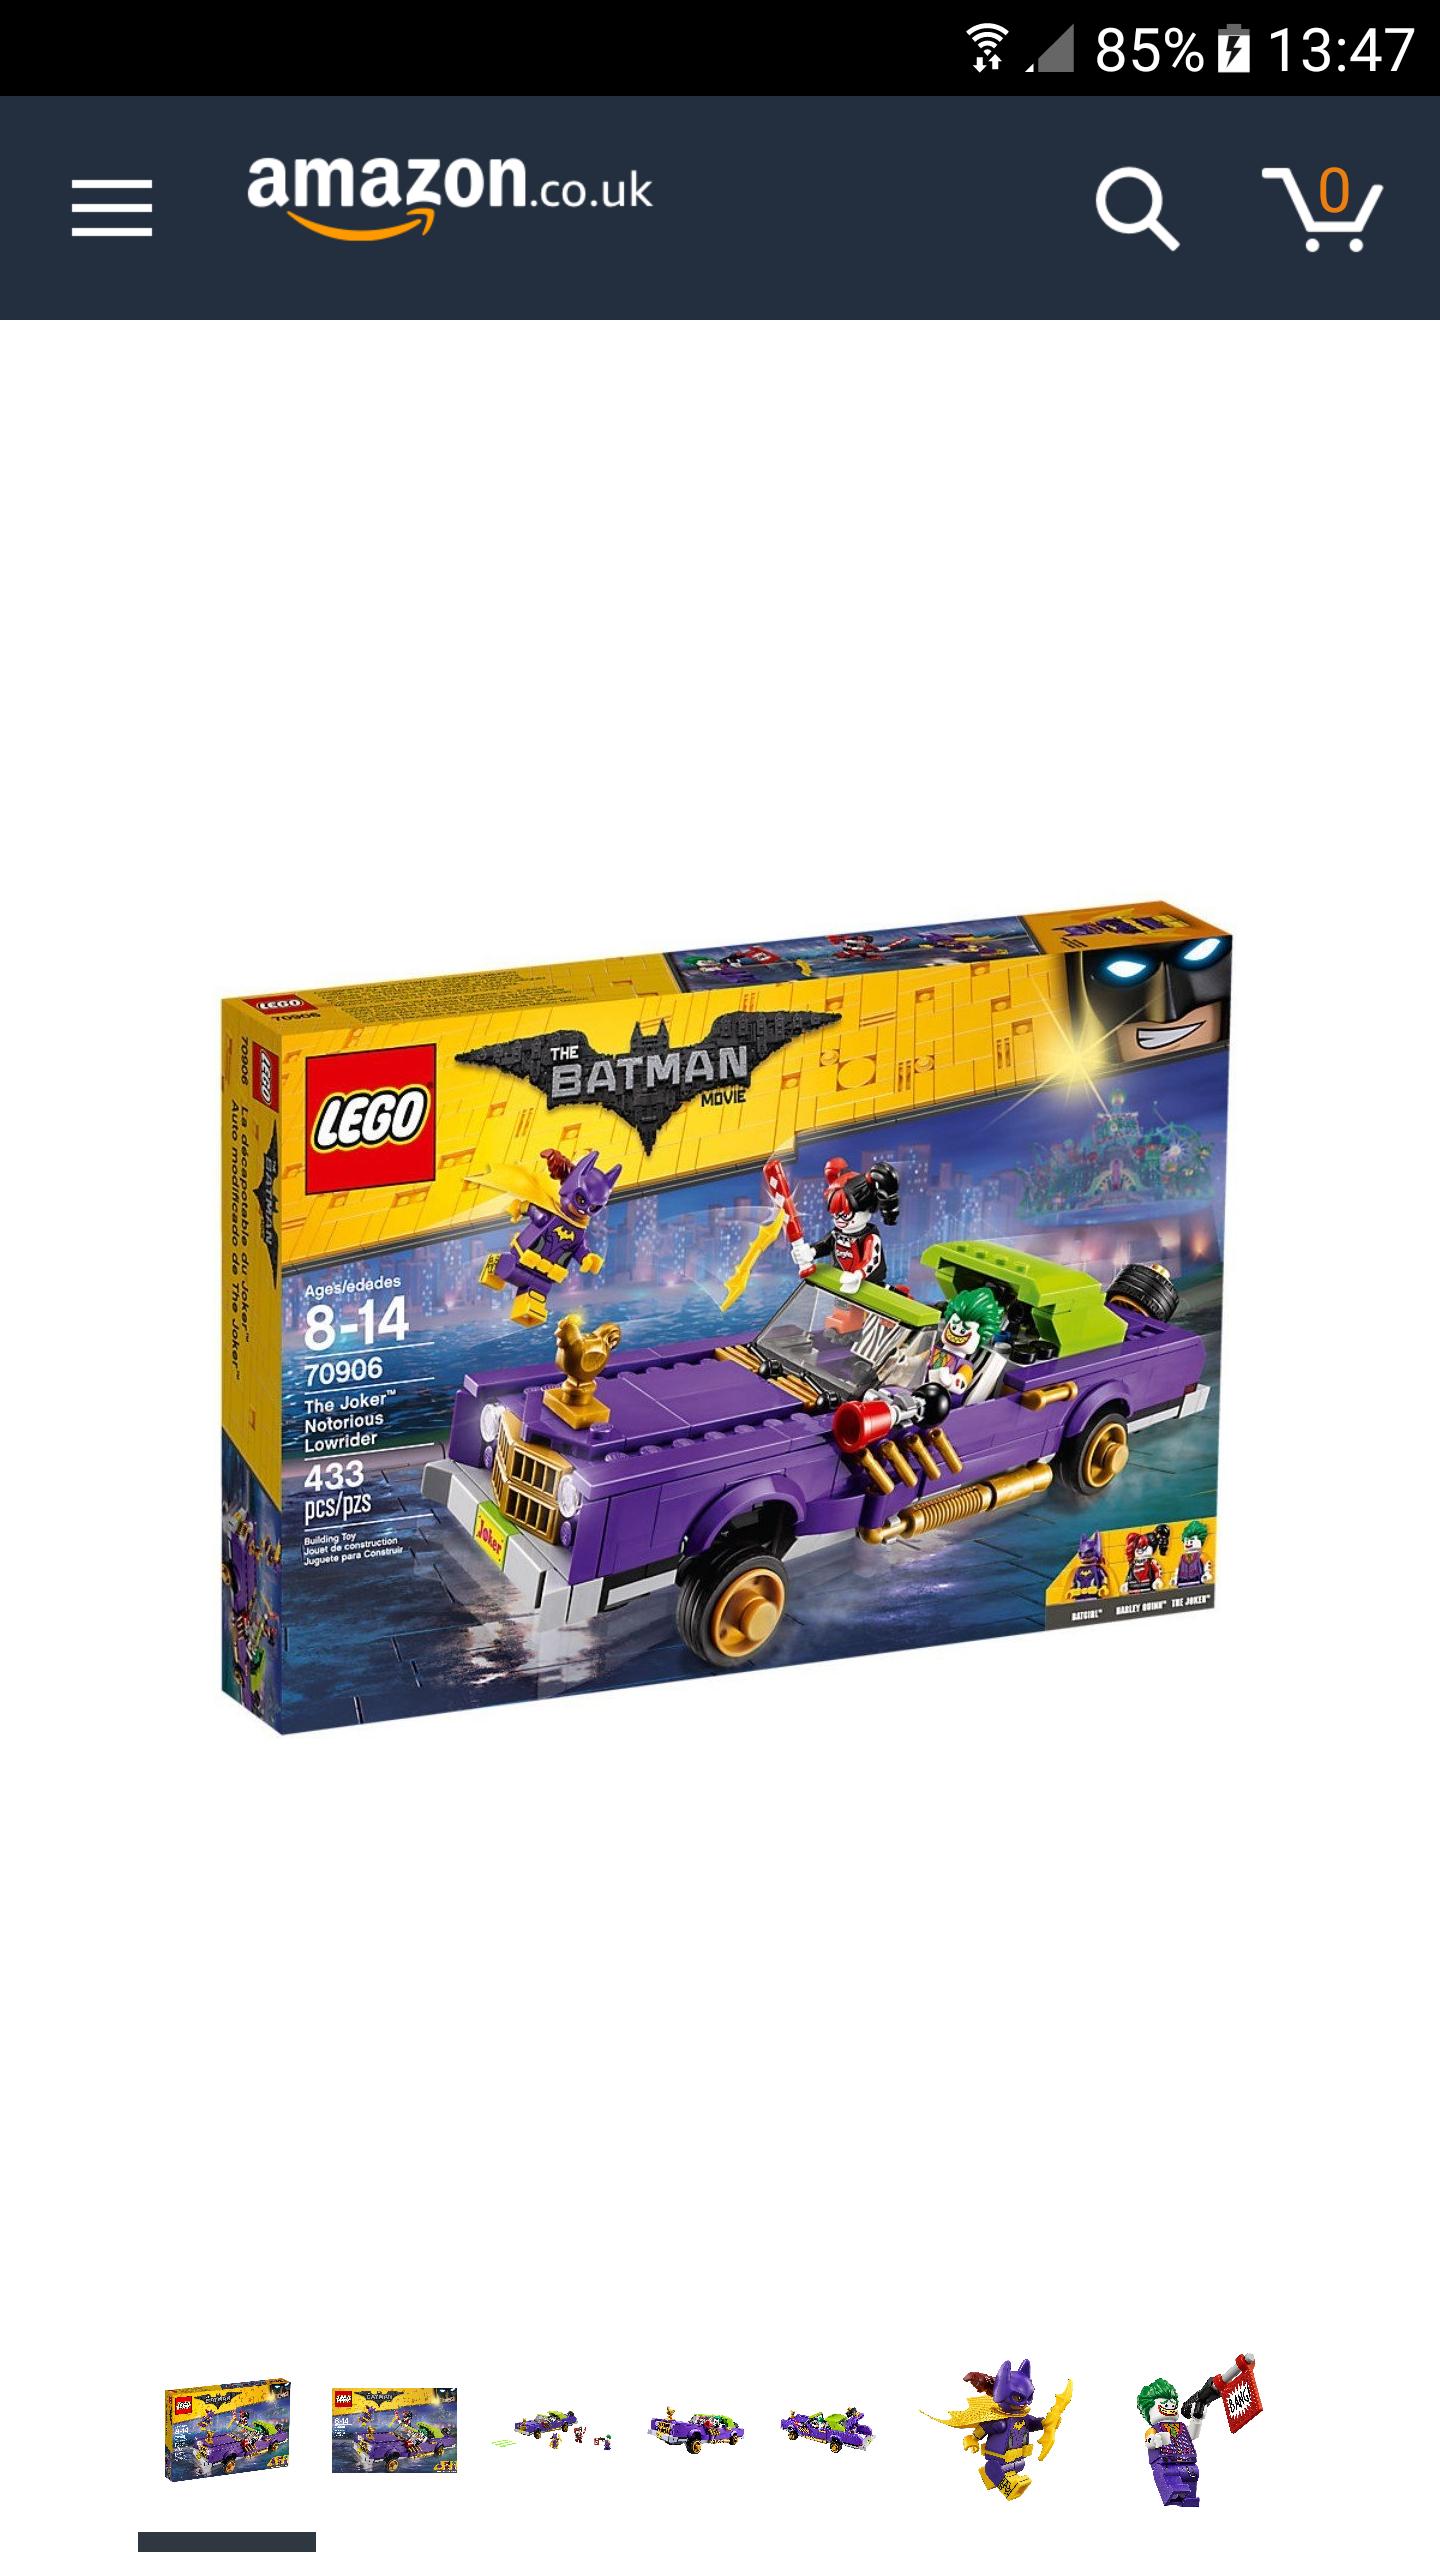 LEGO Batman The Joker Notorious Lowrider £32.99 @ Amazon